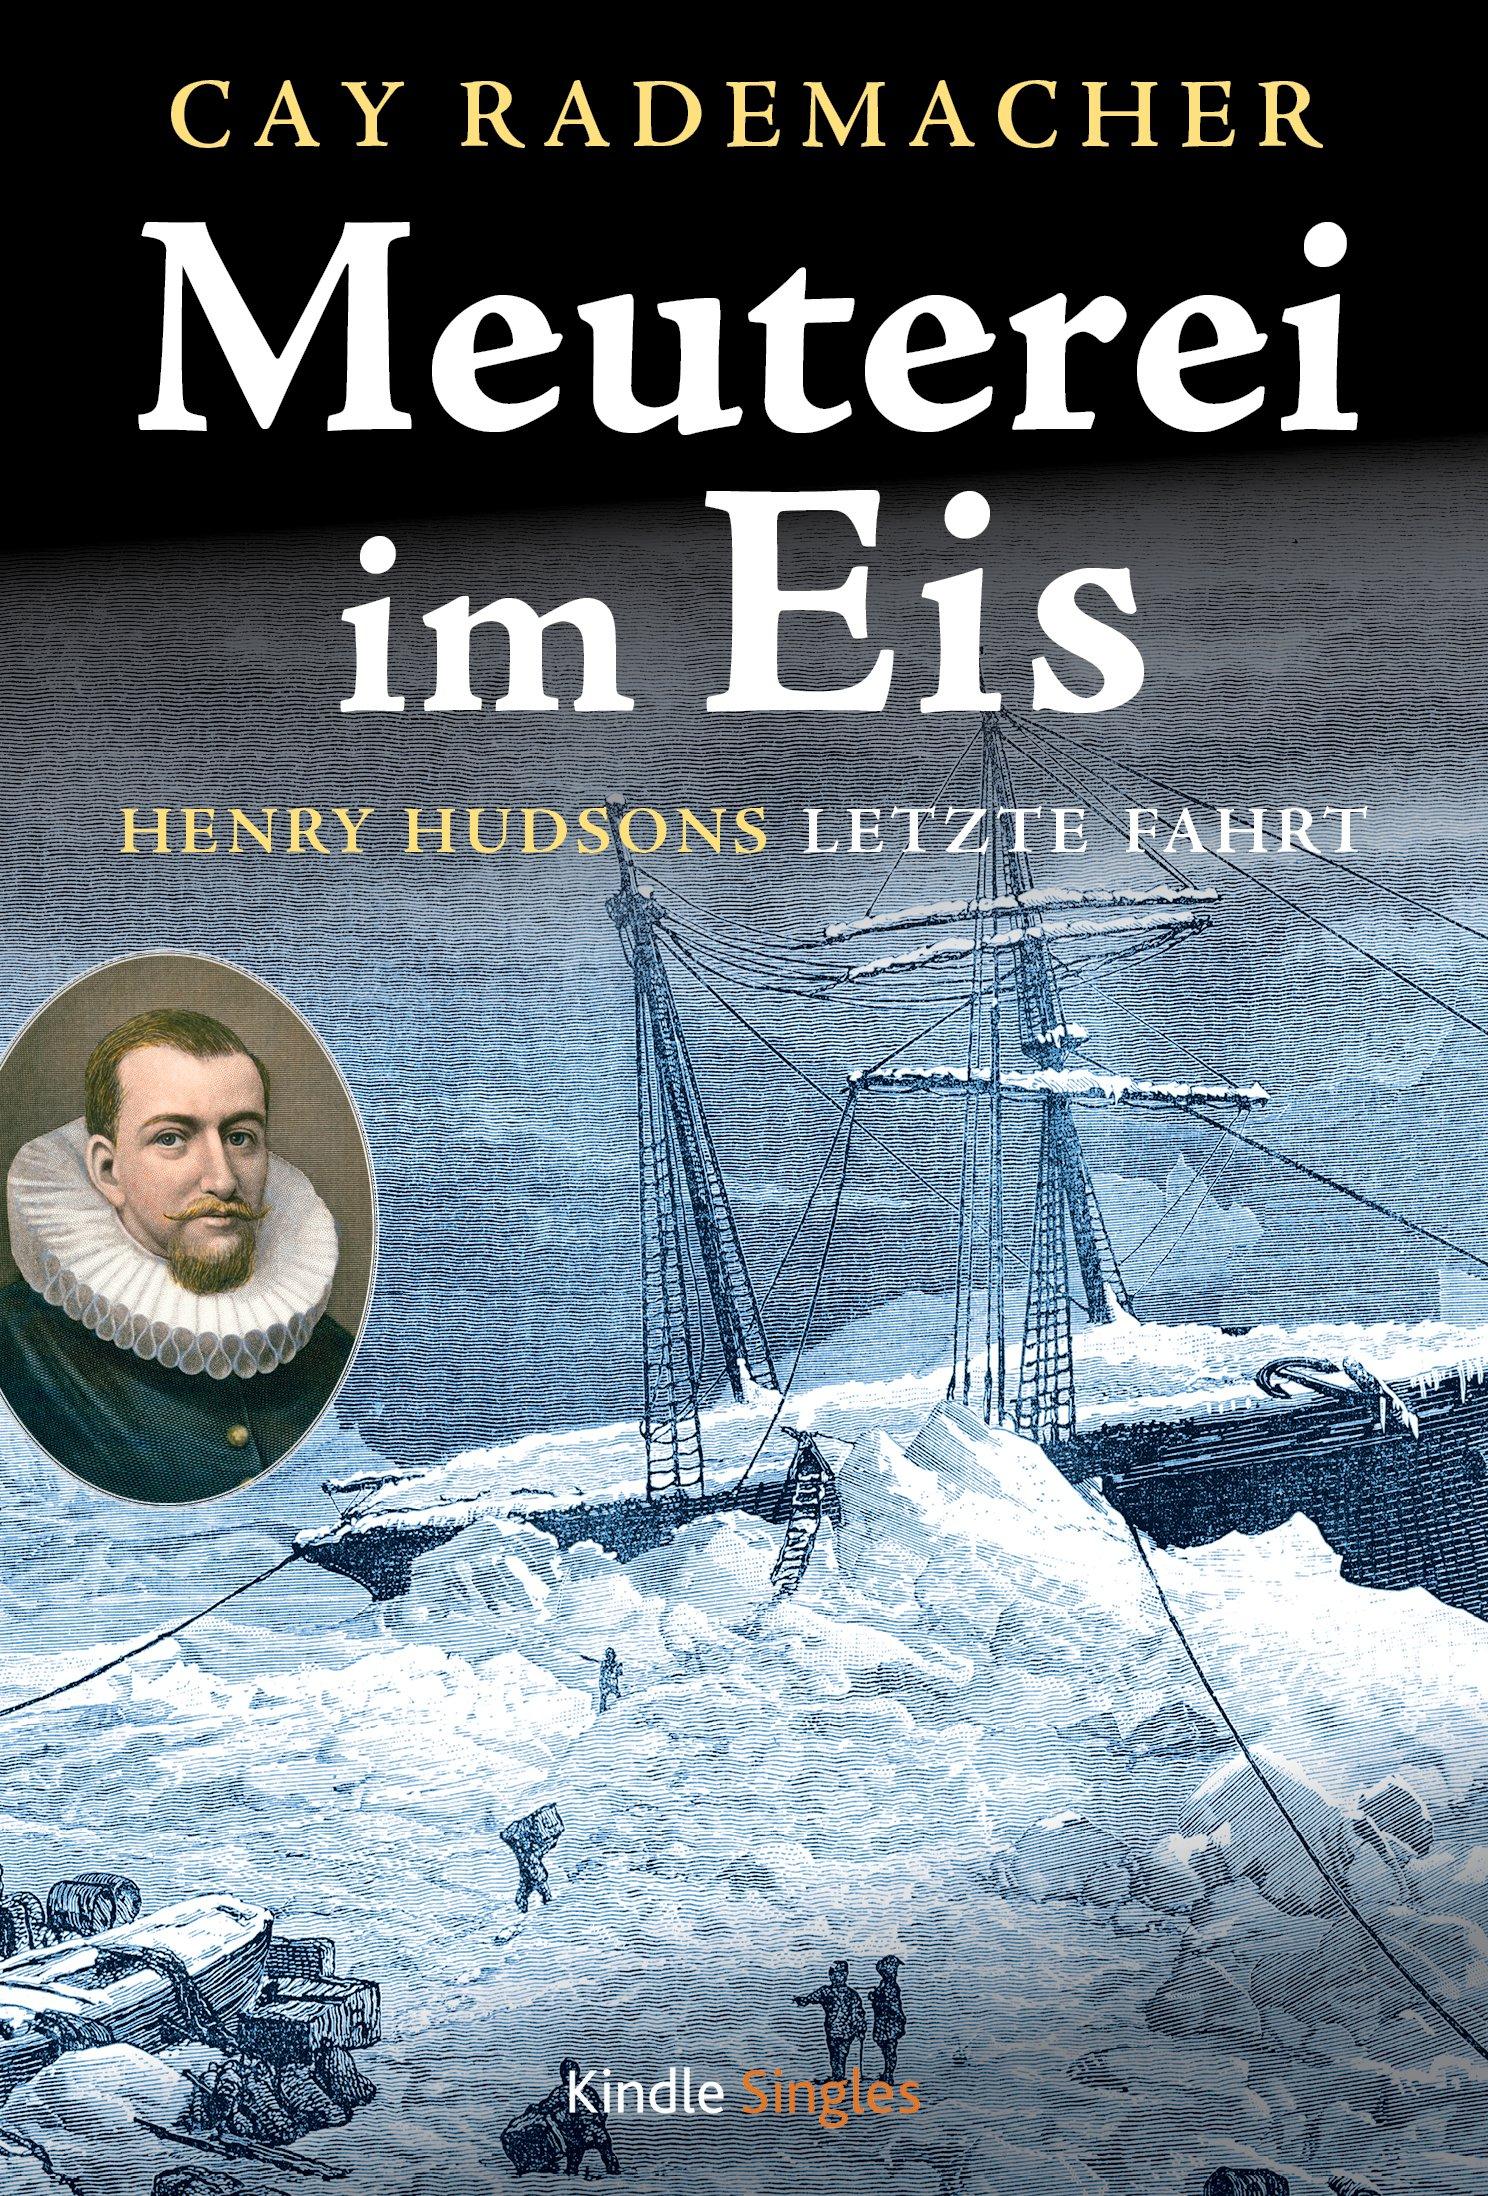 Meuterei im Eis - Henry Hudsons letzte Fahrt (Kindle Single) (German Edition) por Cay Rademacher